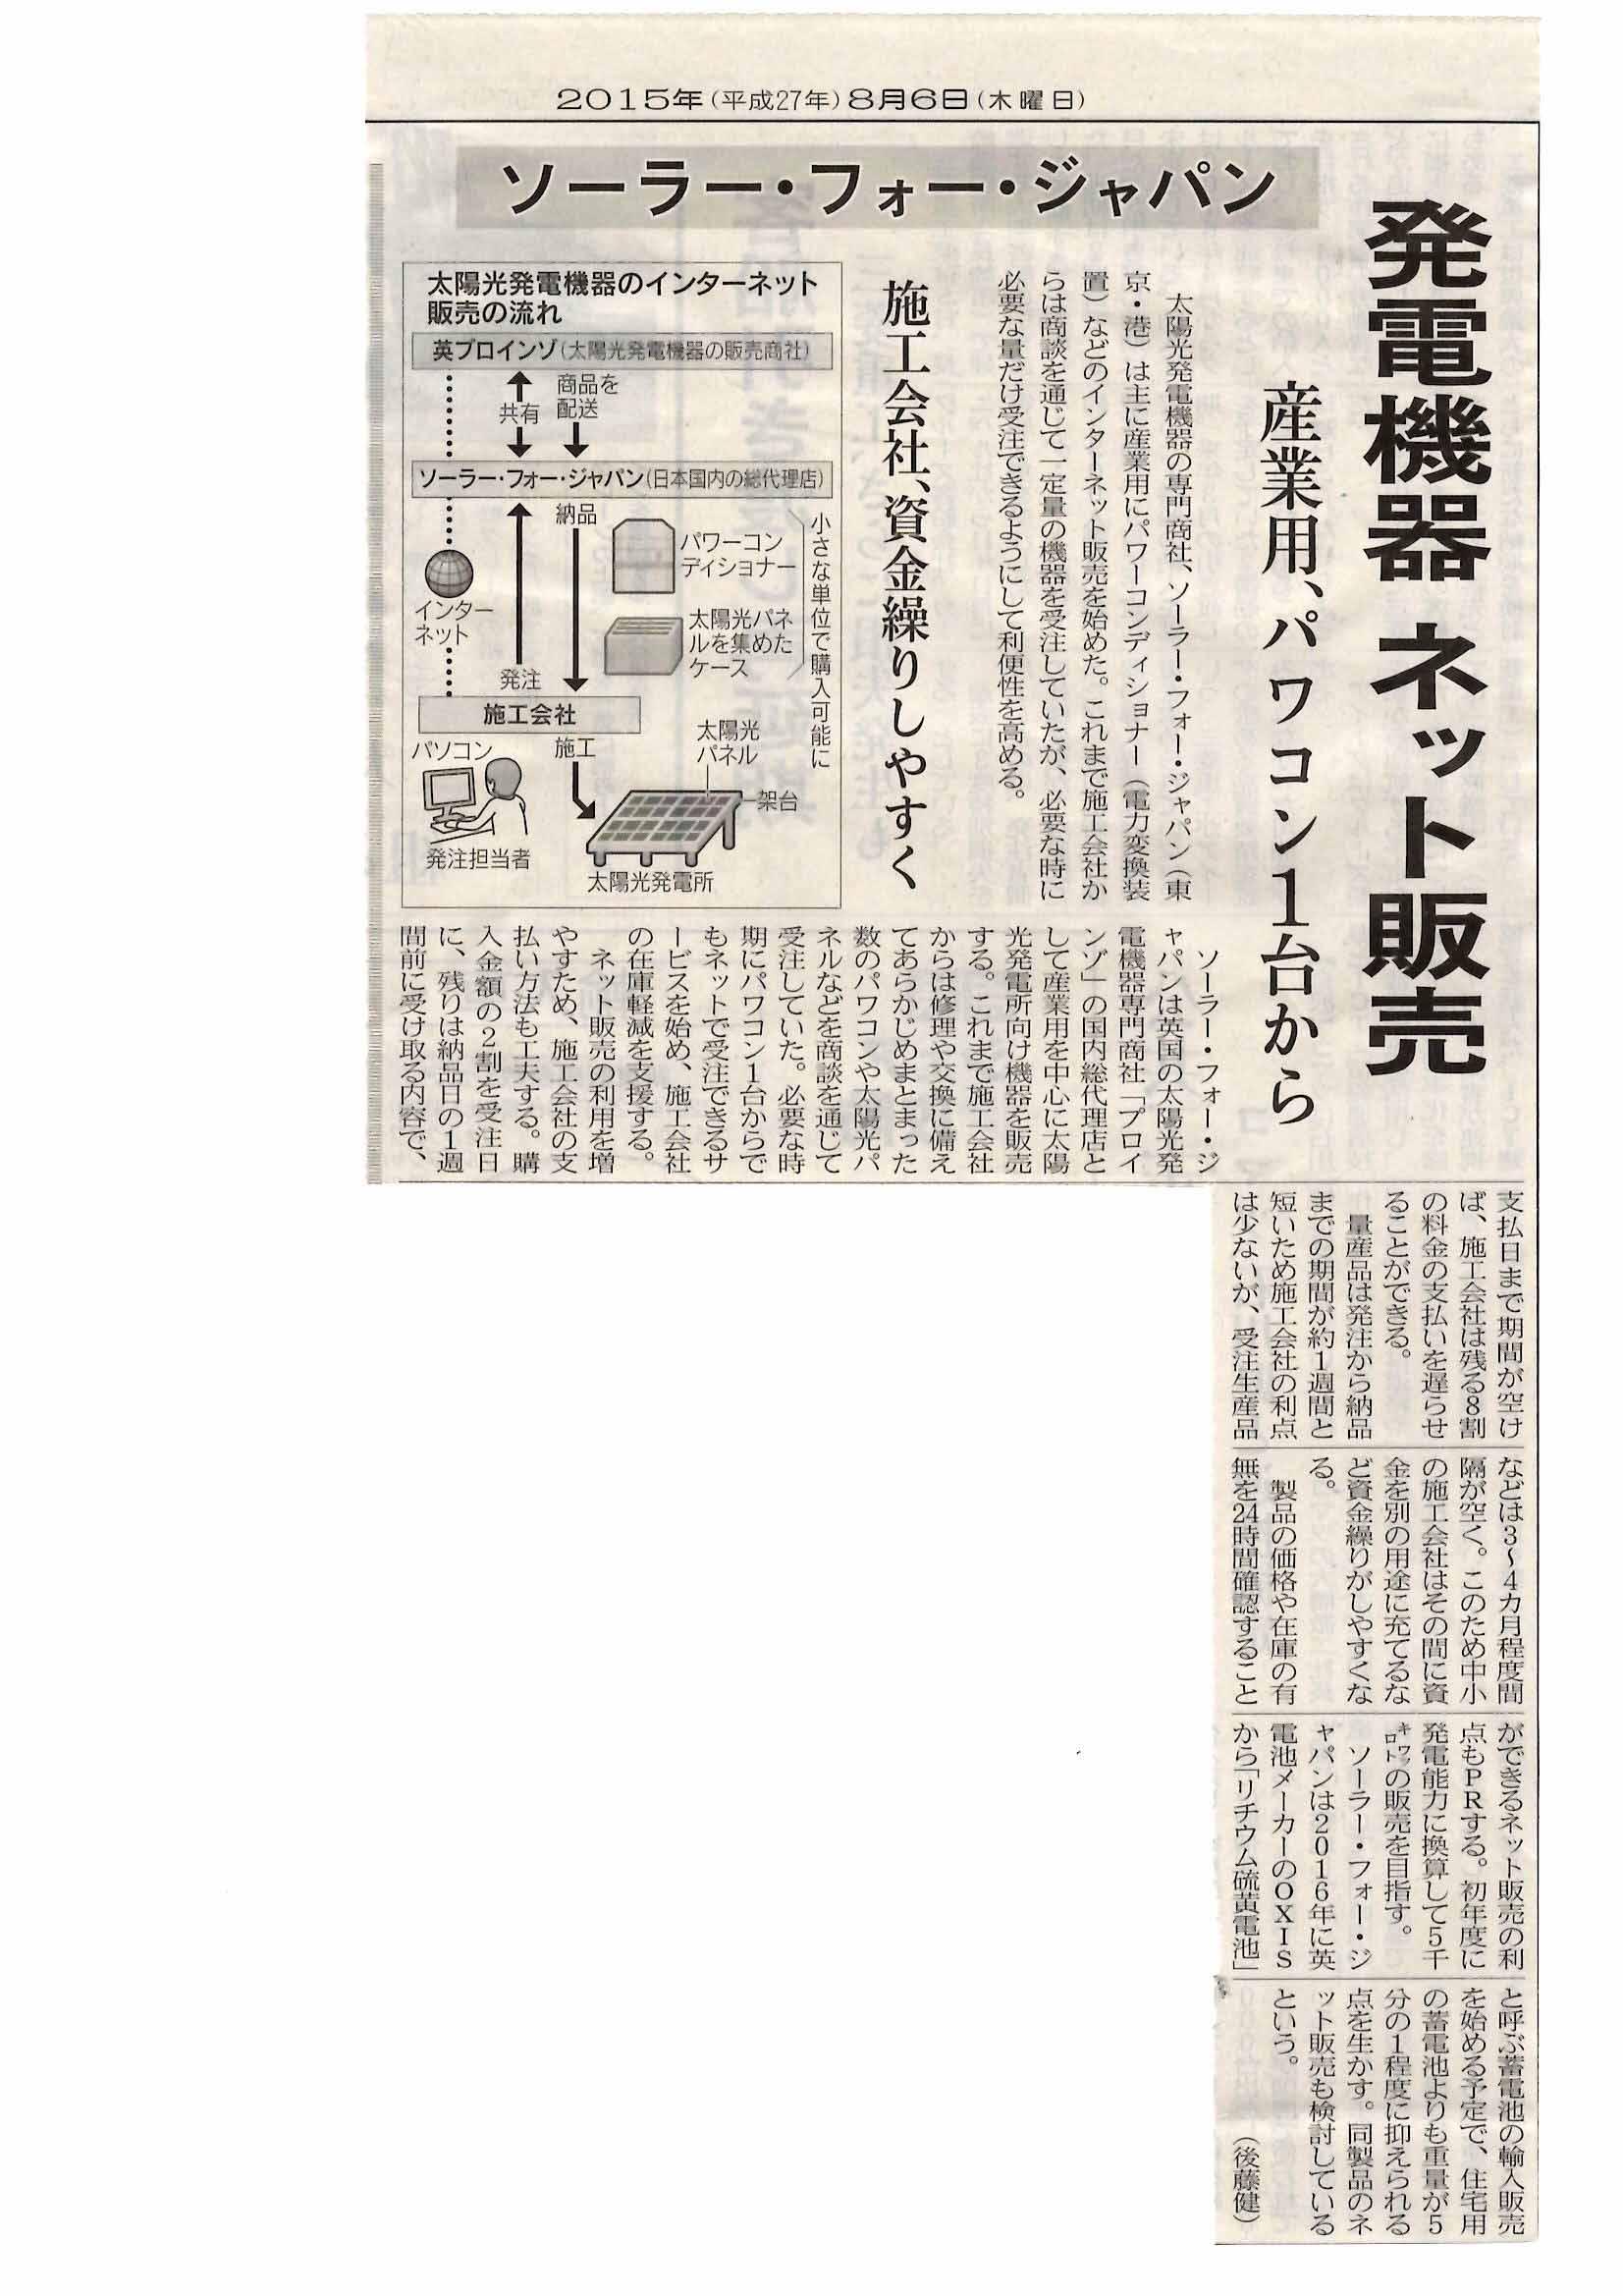 SFJ日経産業新聞掲載